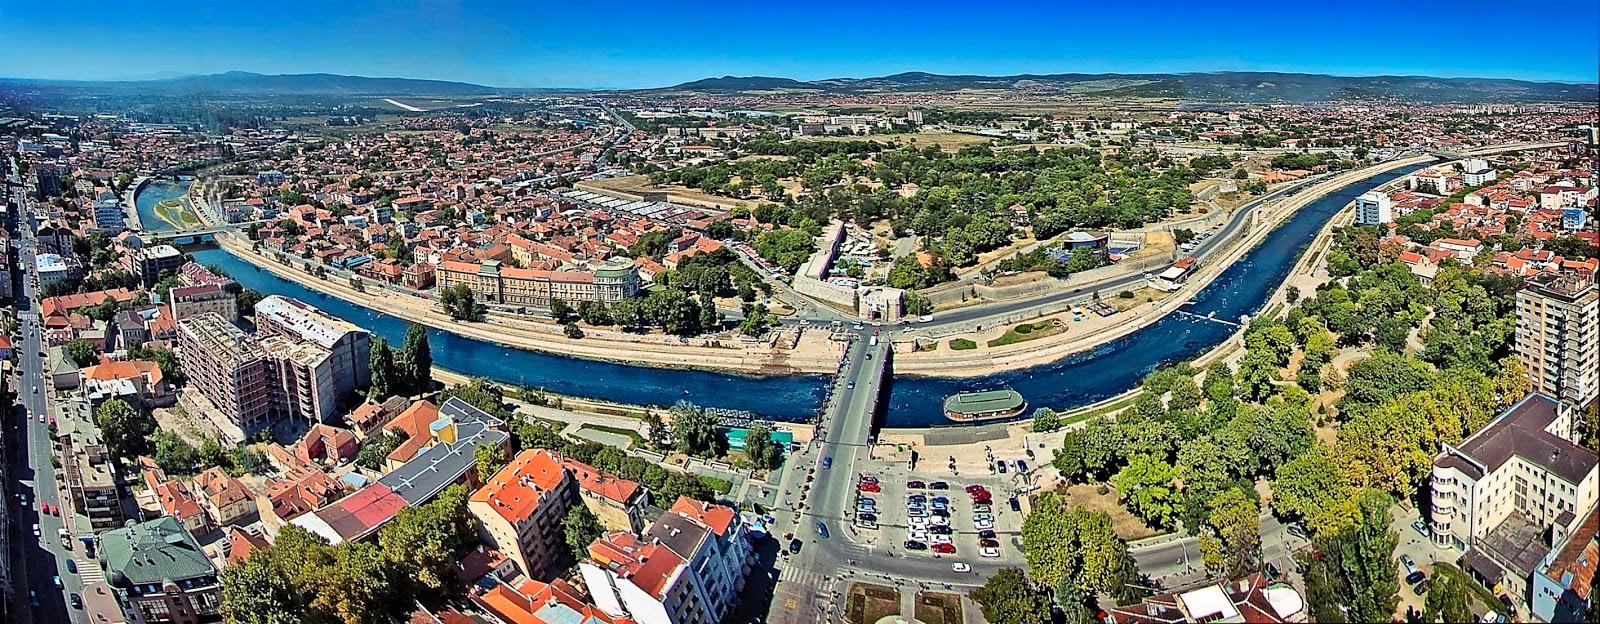 sırbistan turistik ile ilgili görsel sonucu